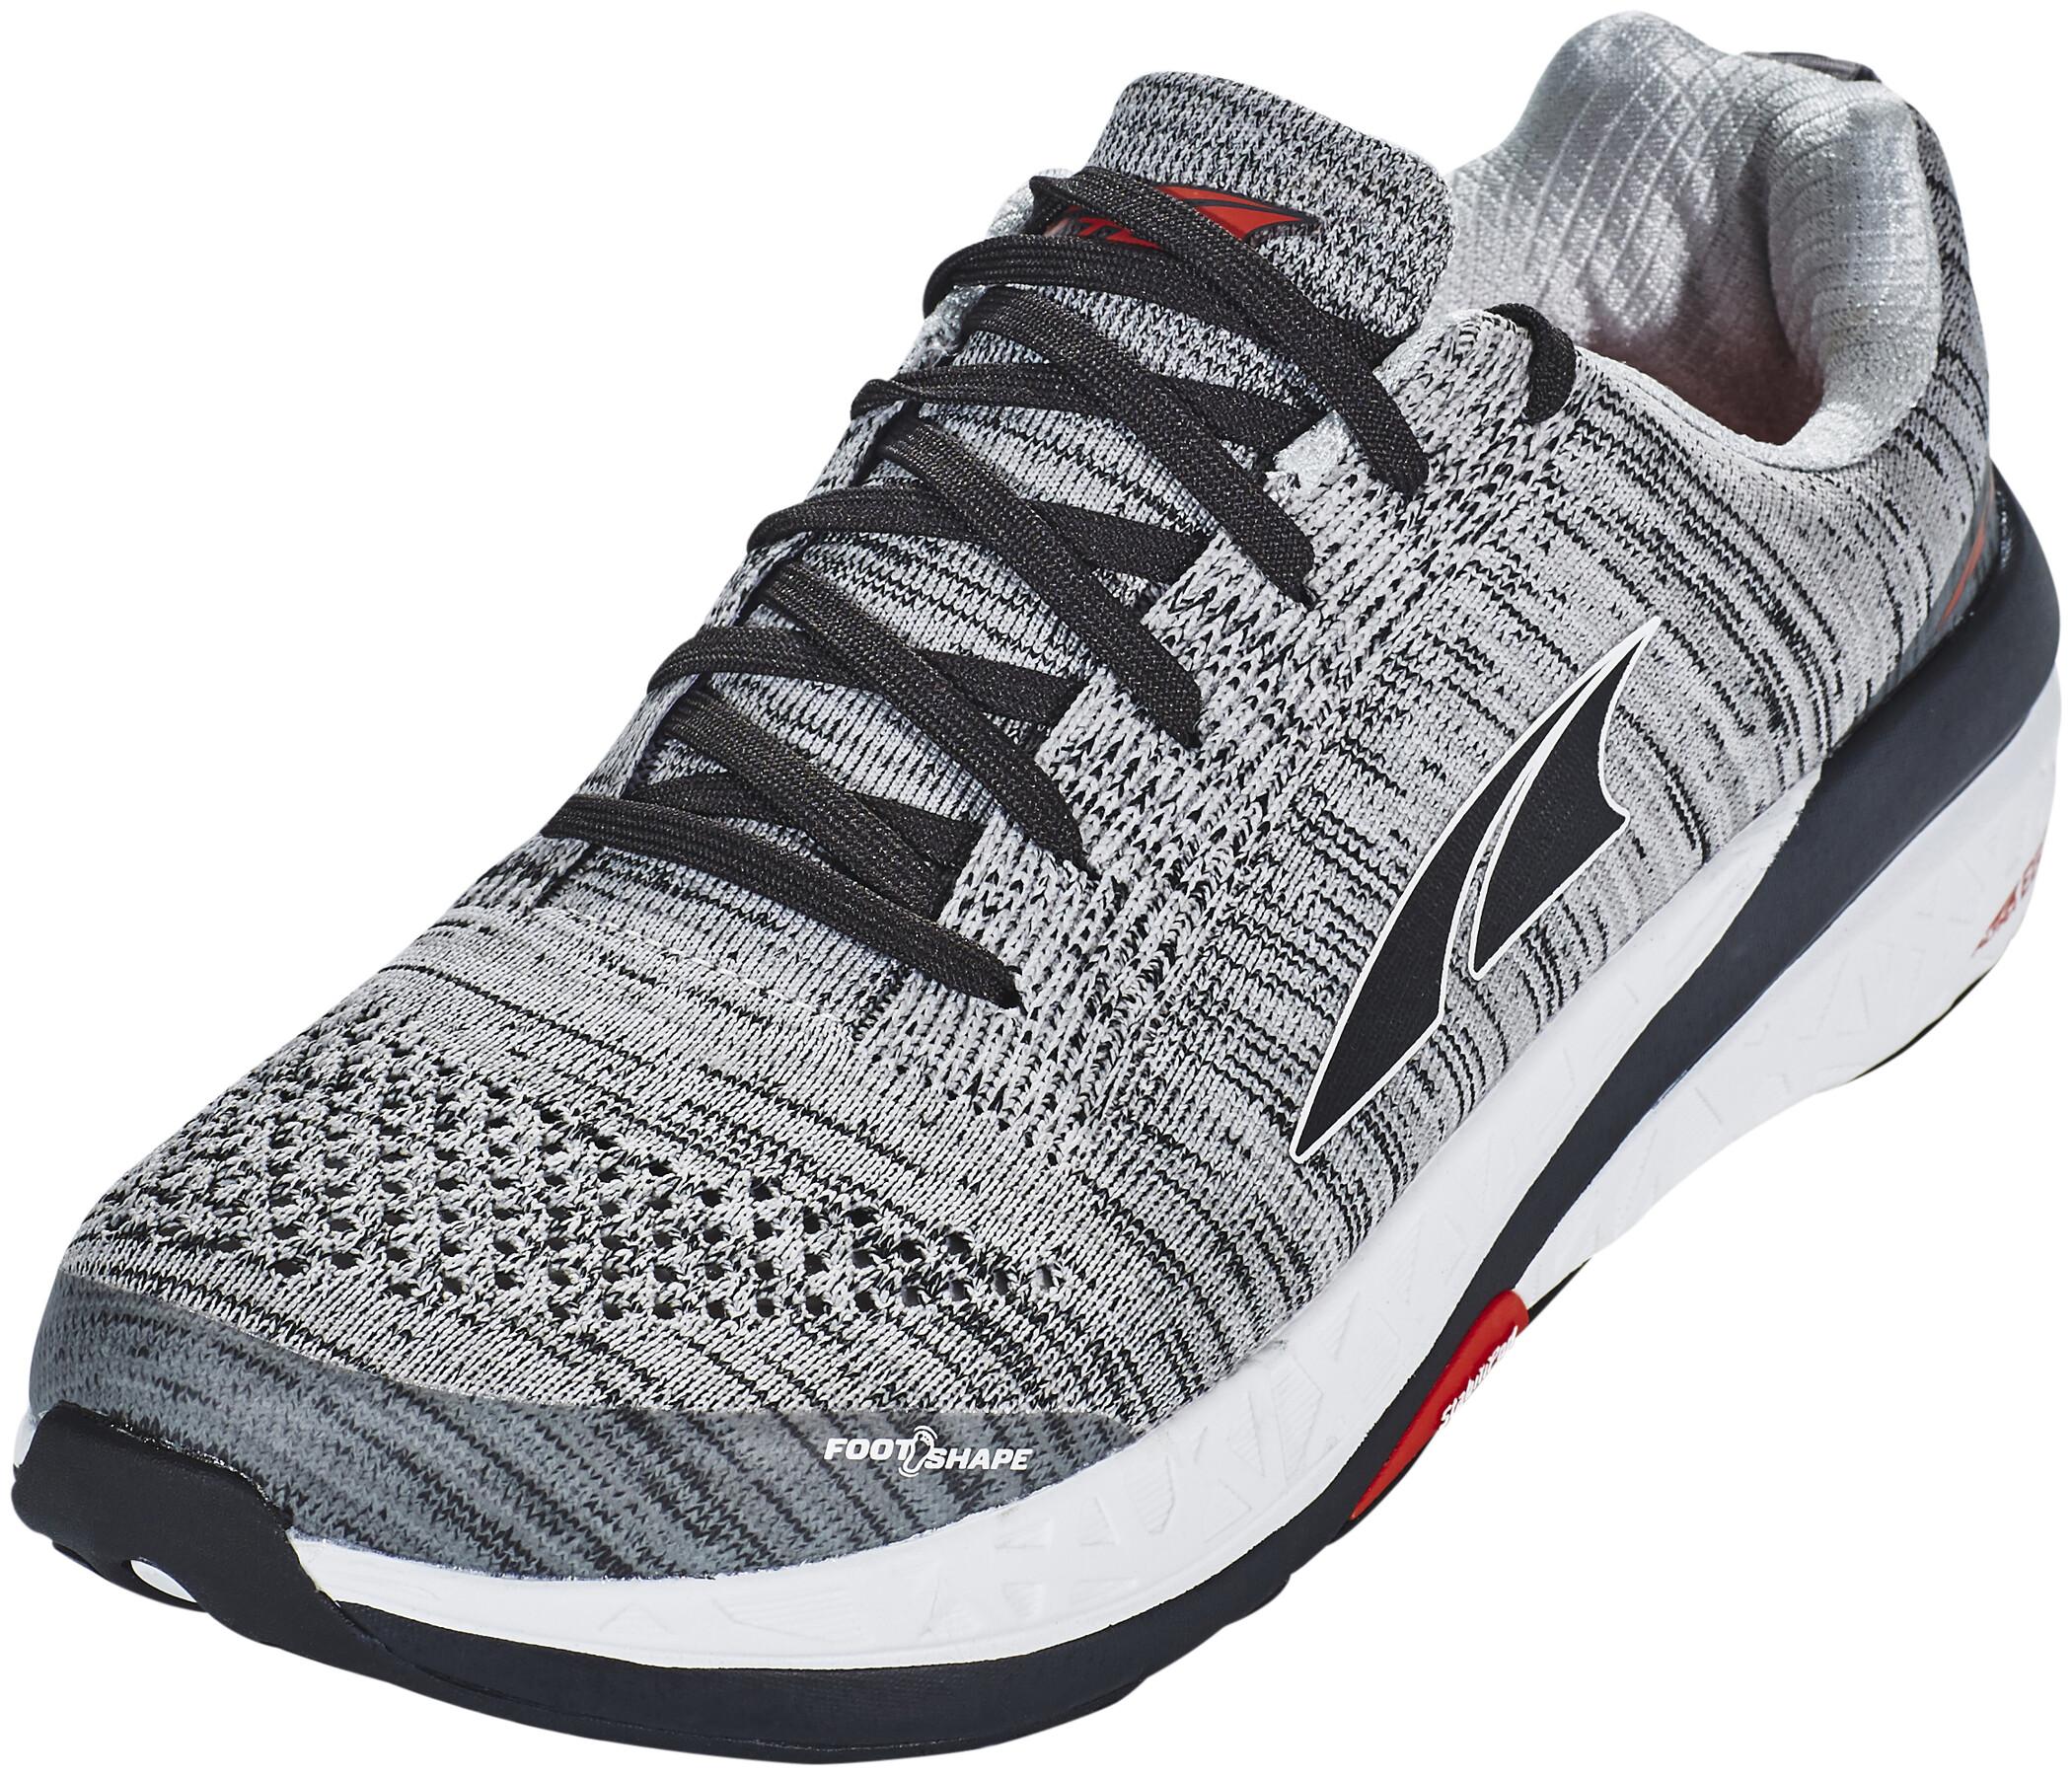 Altra Paradigm 4 Sko Herrer, gray/red (2019) | Running shoes